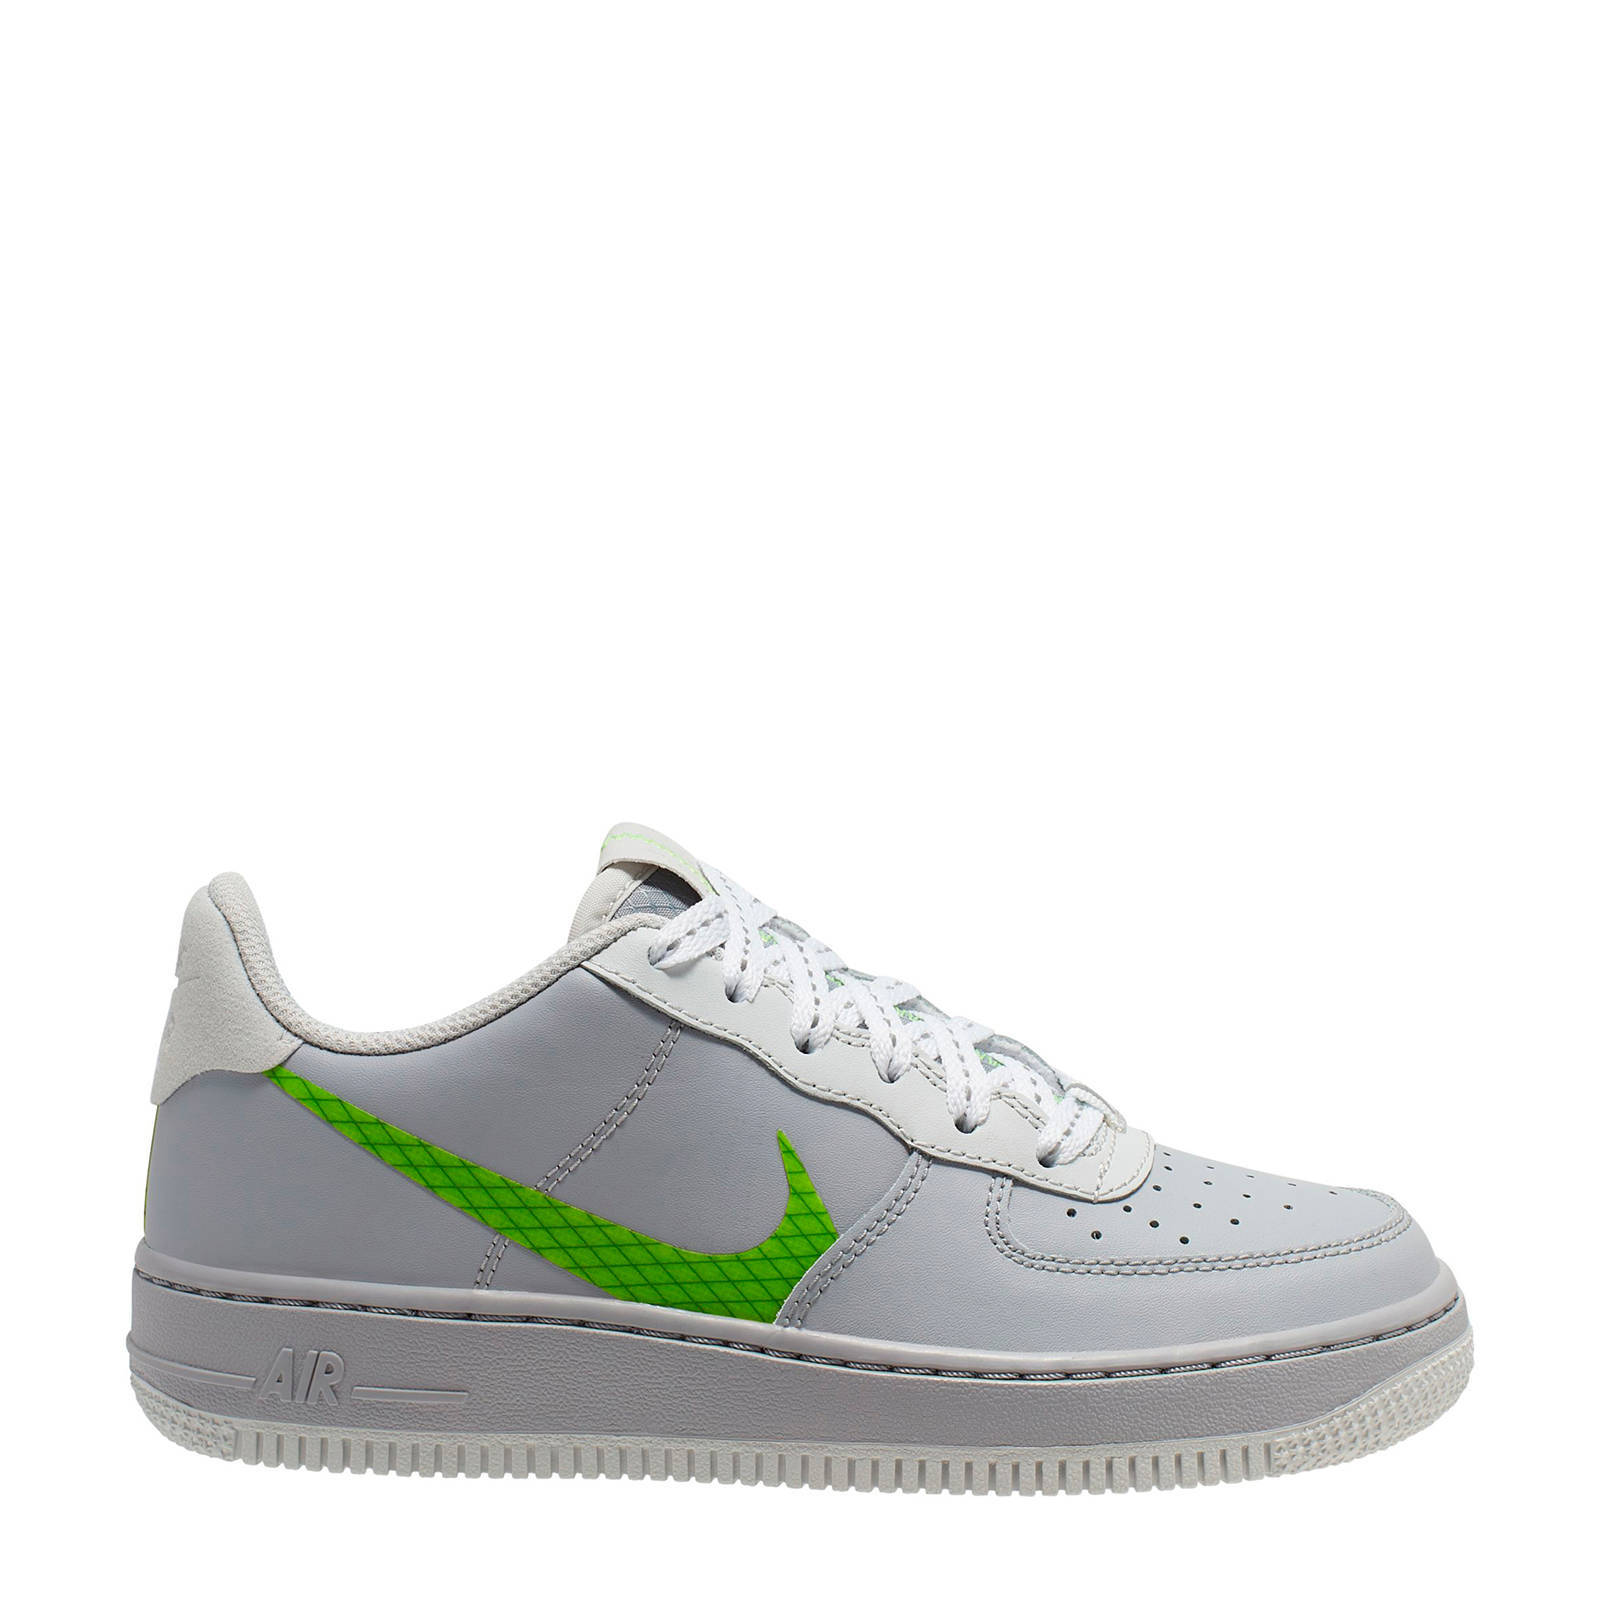 Nike Air Force 1 LV8 3 schoenen wit